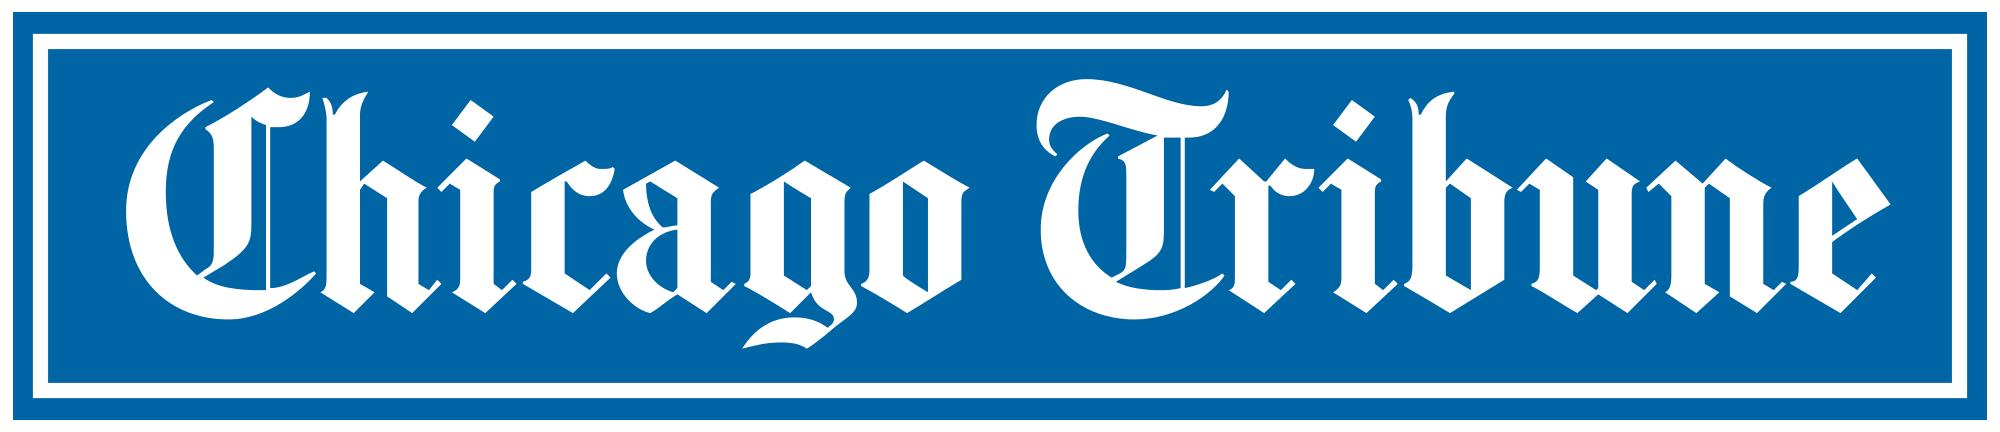 2000px-chicago-tribune-logo.png